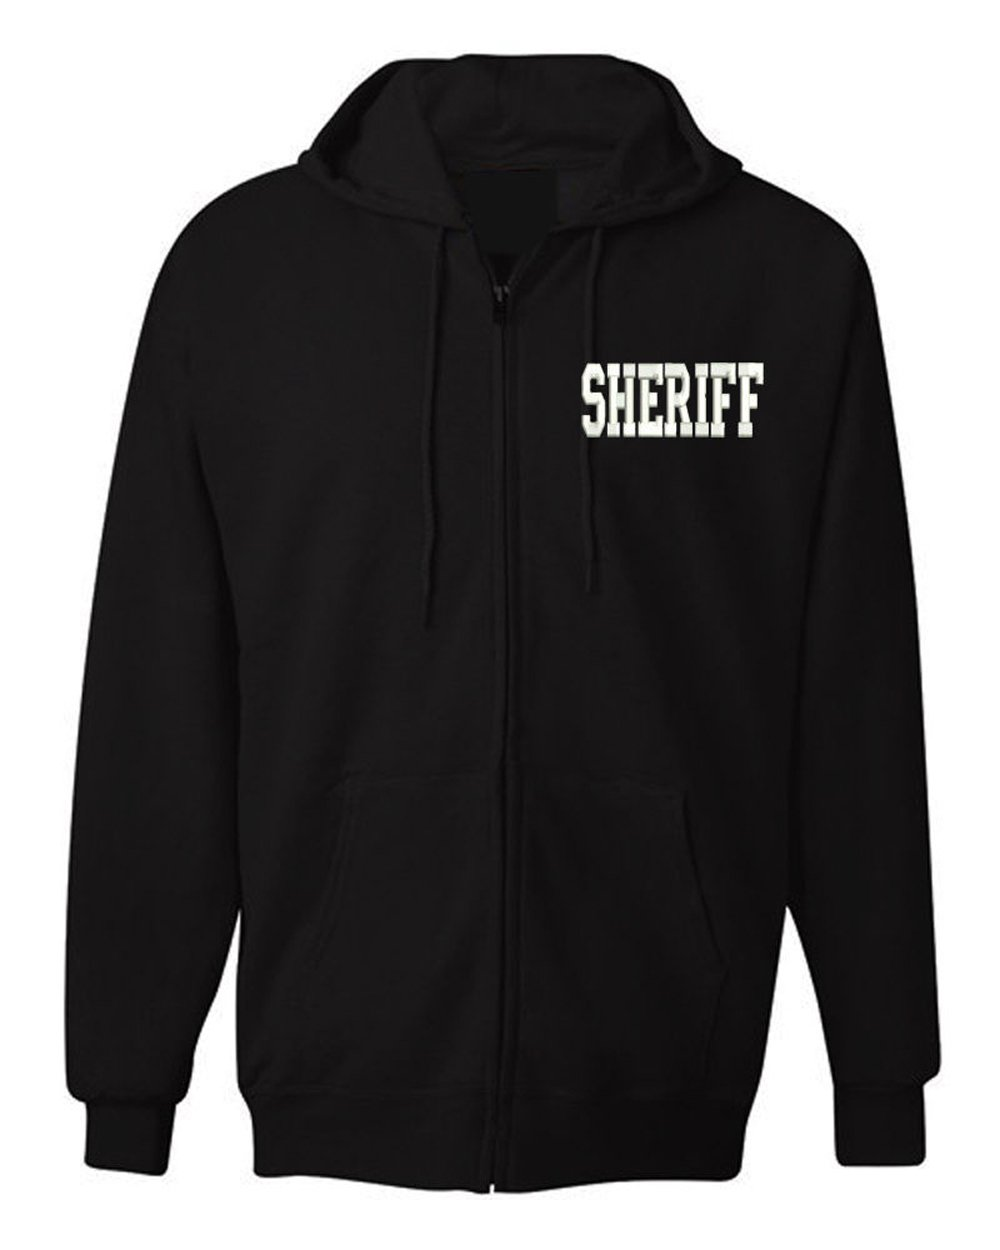 American Law Enforcement Military Sheriff Officerジャケットジッパーhoodie-3 X L B01M0MQGE6